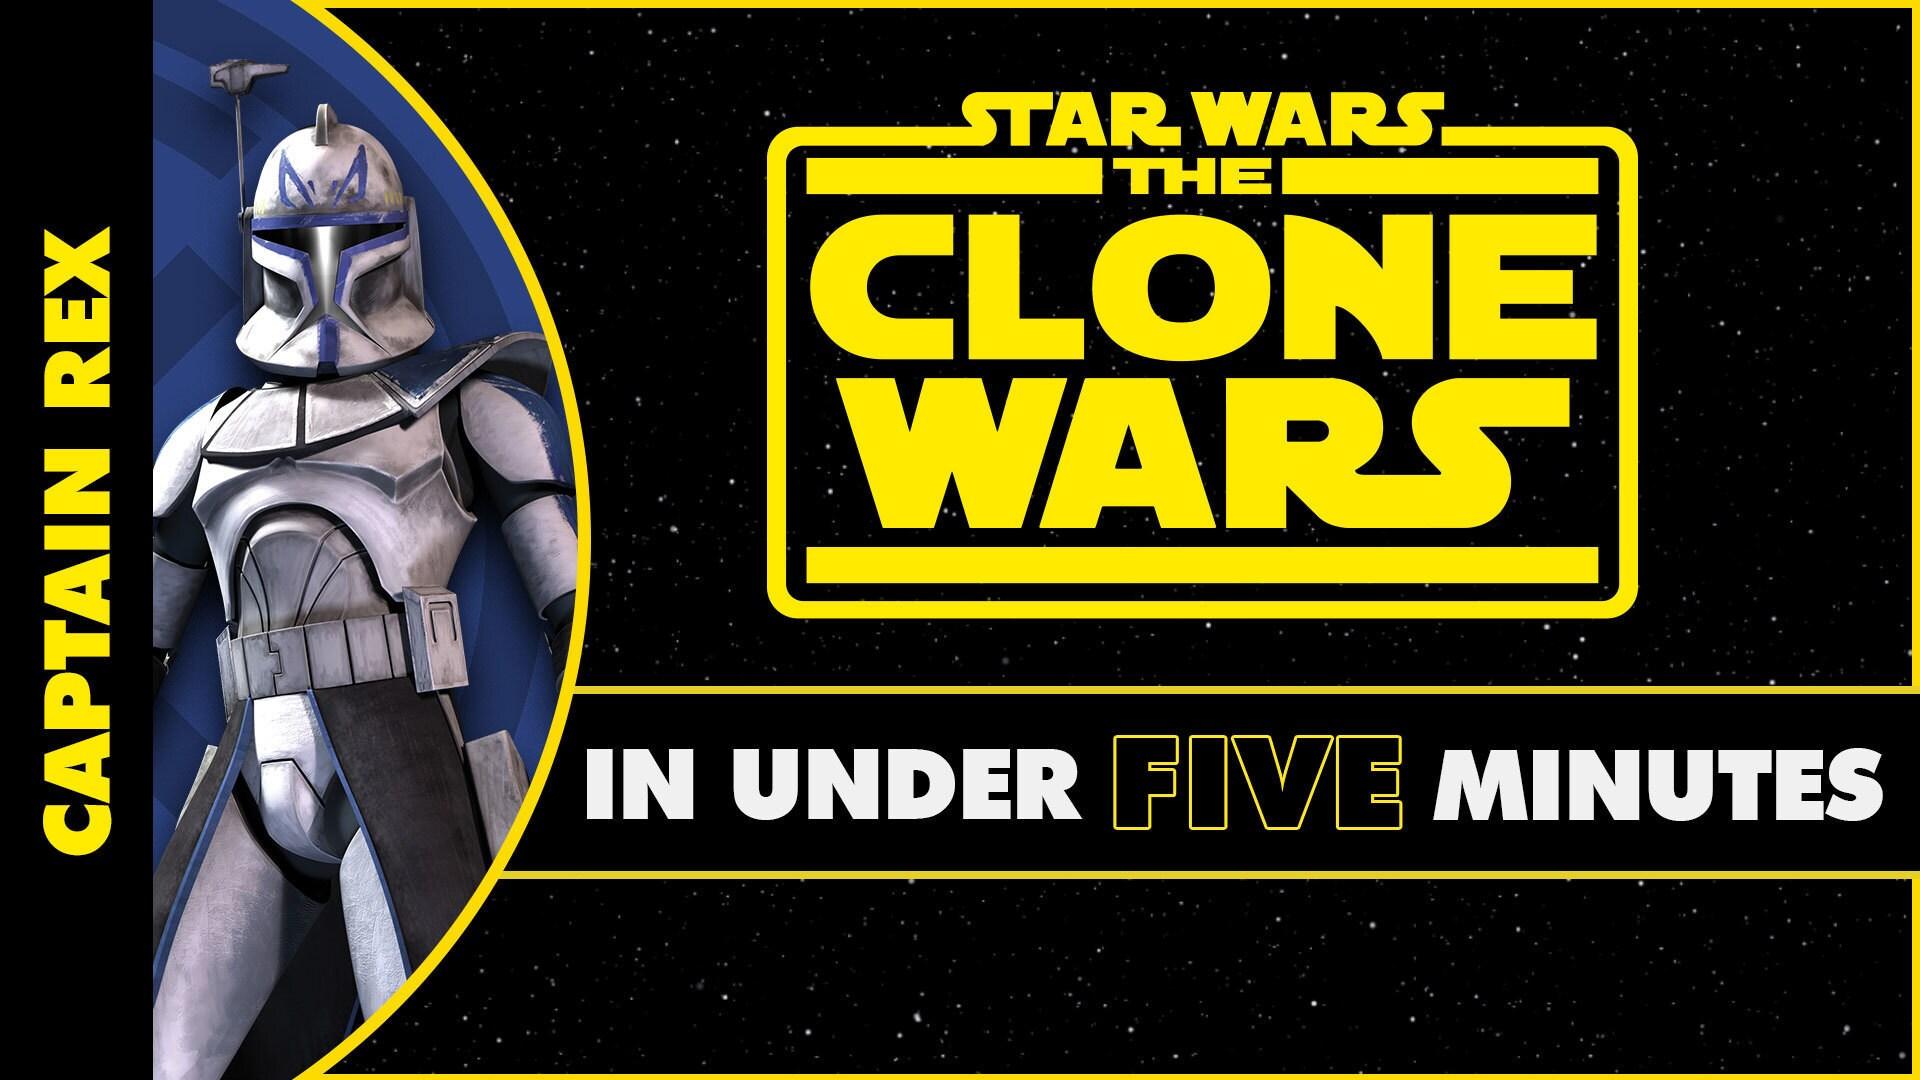 Captain Rex's Journey in Star Wars: The Clone Wars in Under Five Minutes